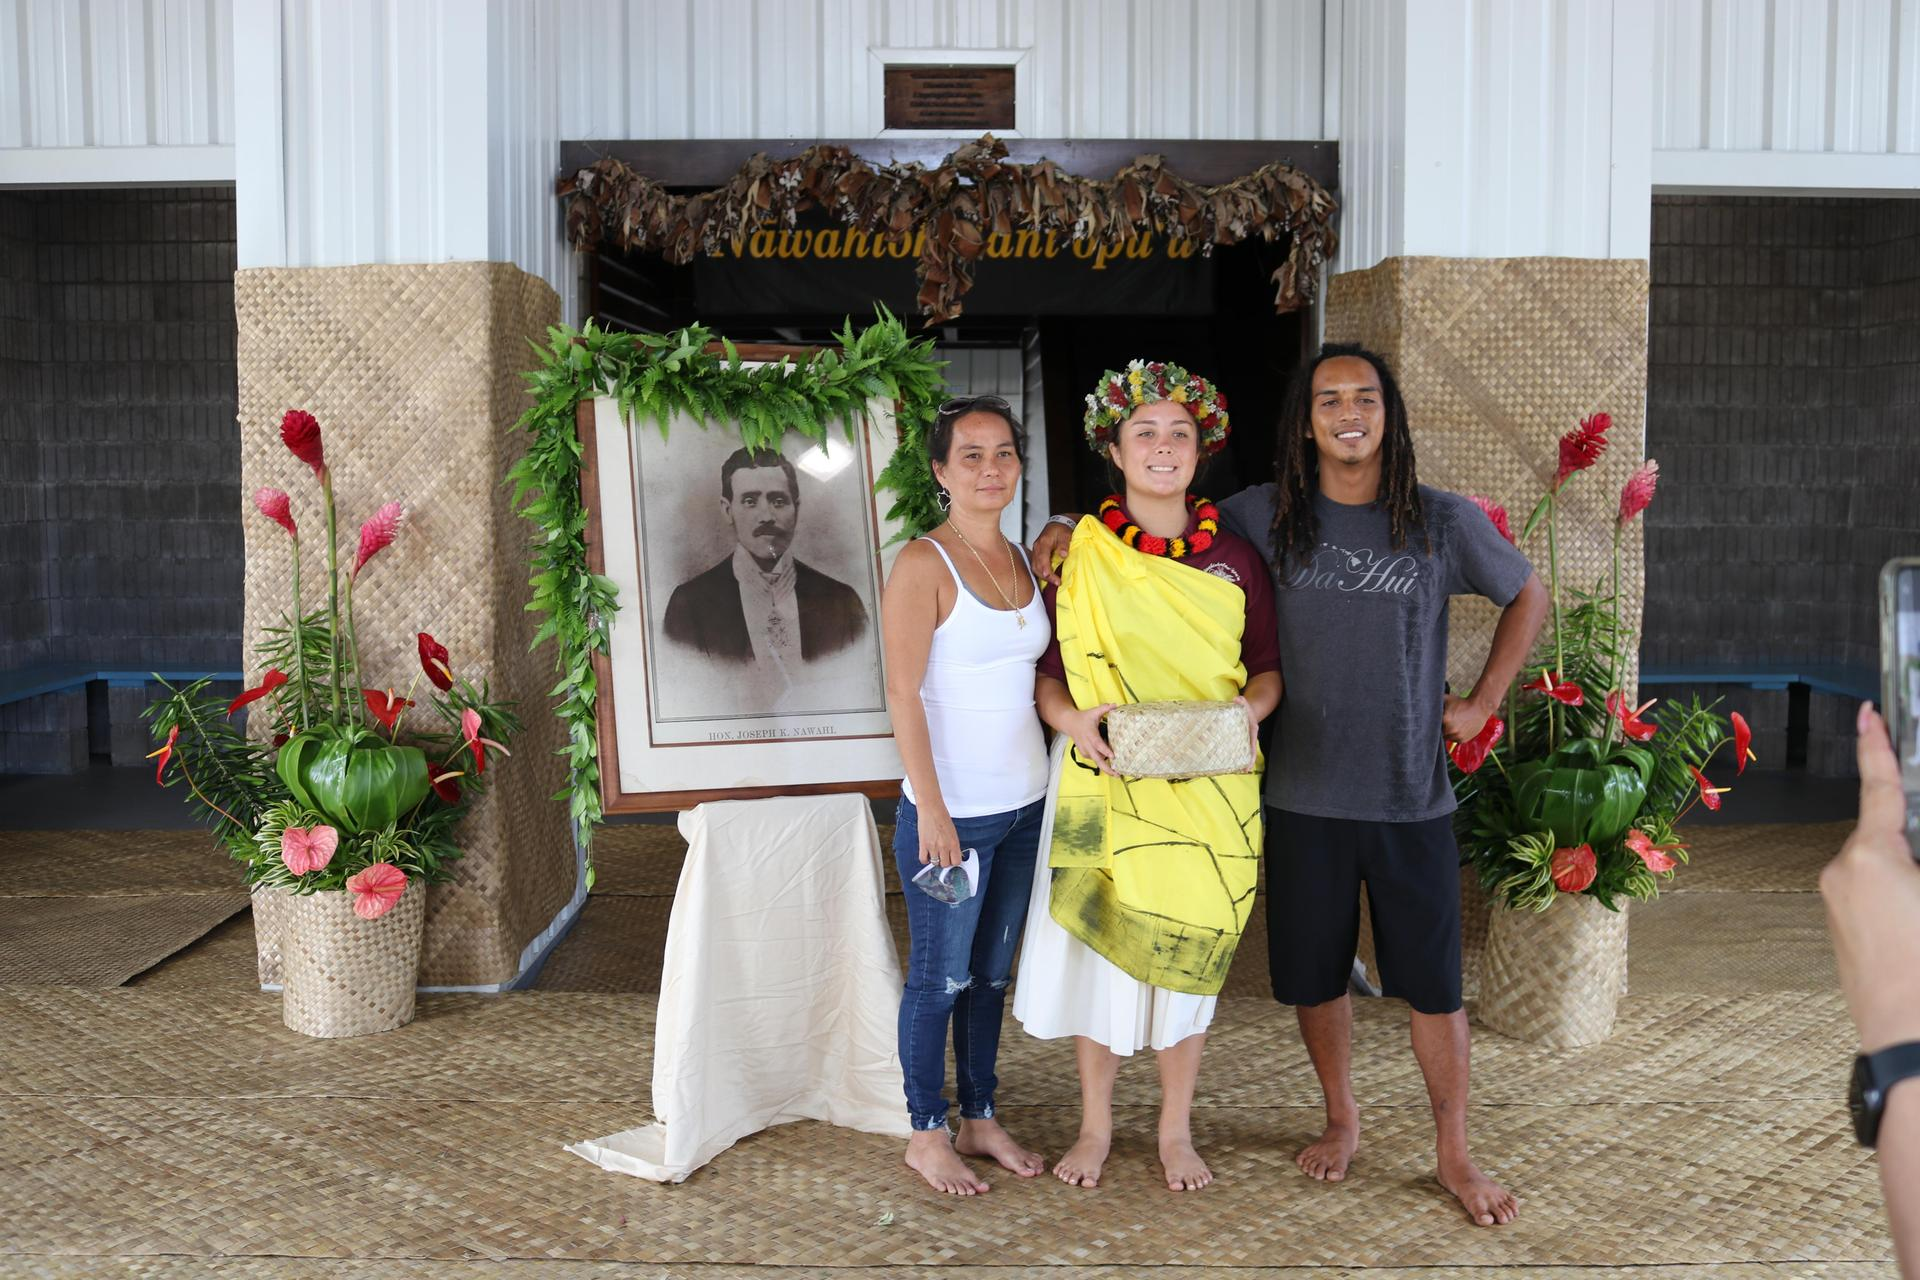 Keliʻikuli